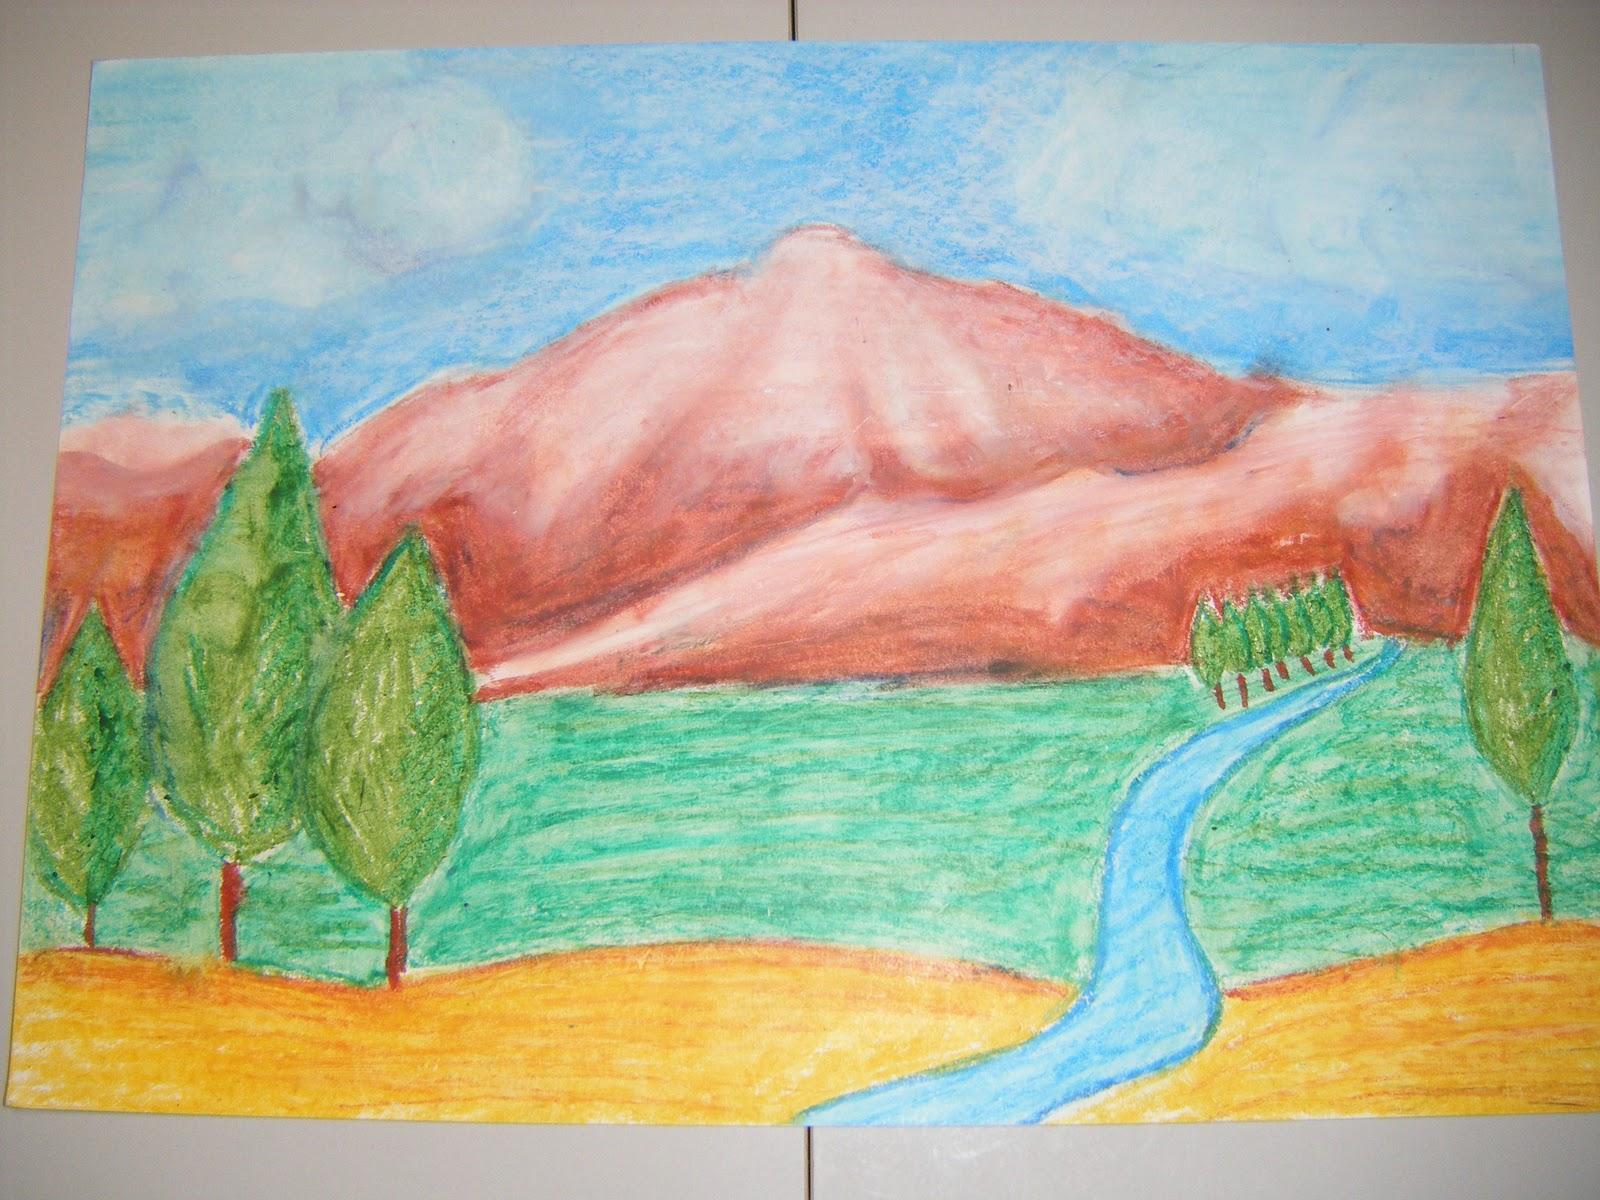 Paisajes para dibujar con color imagui - Paisaje con colores calidos ...